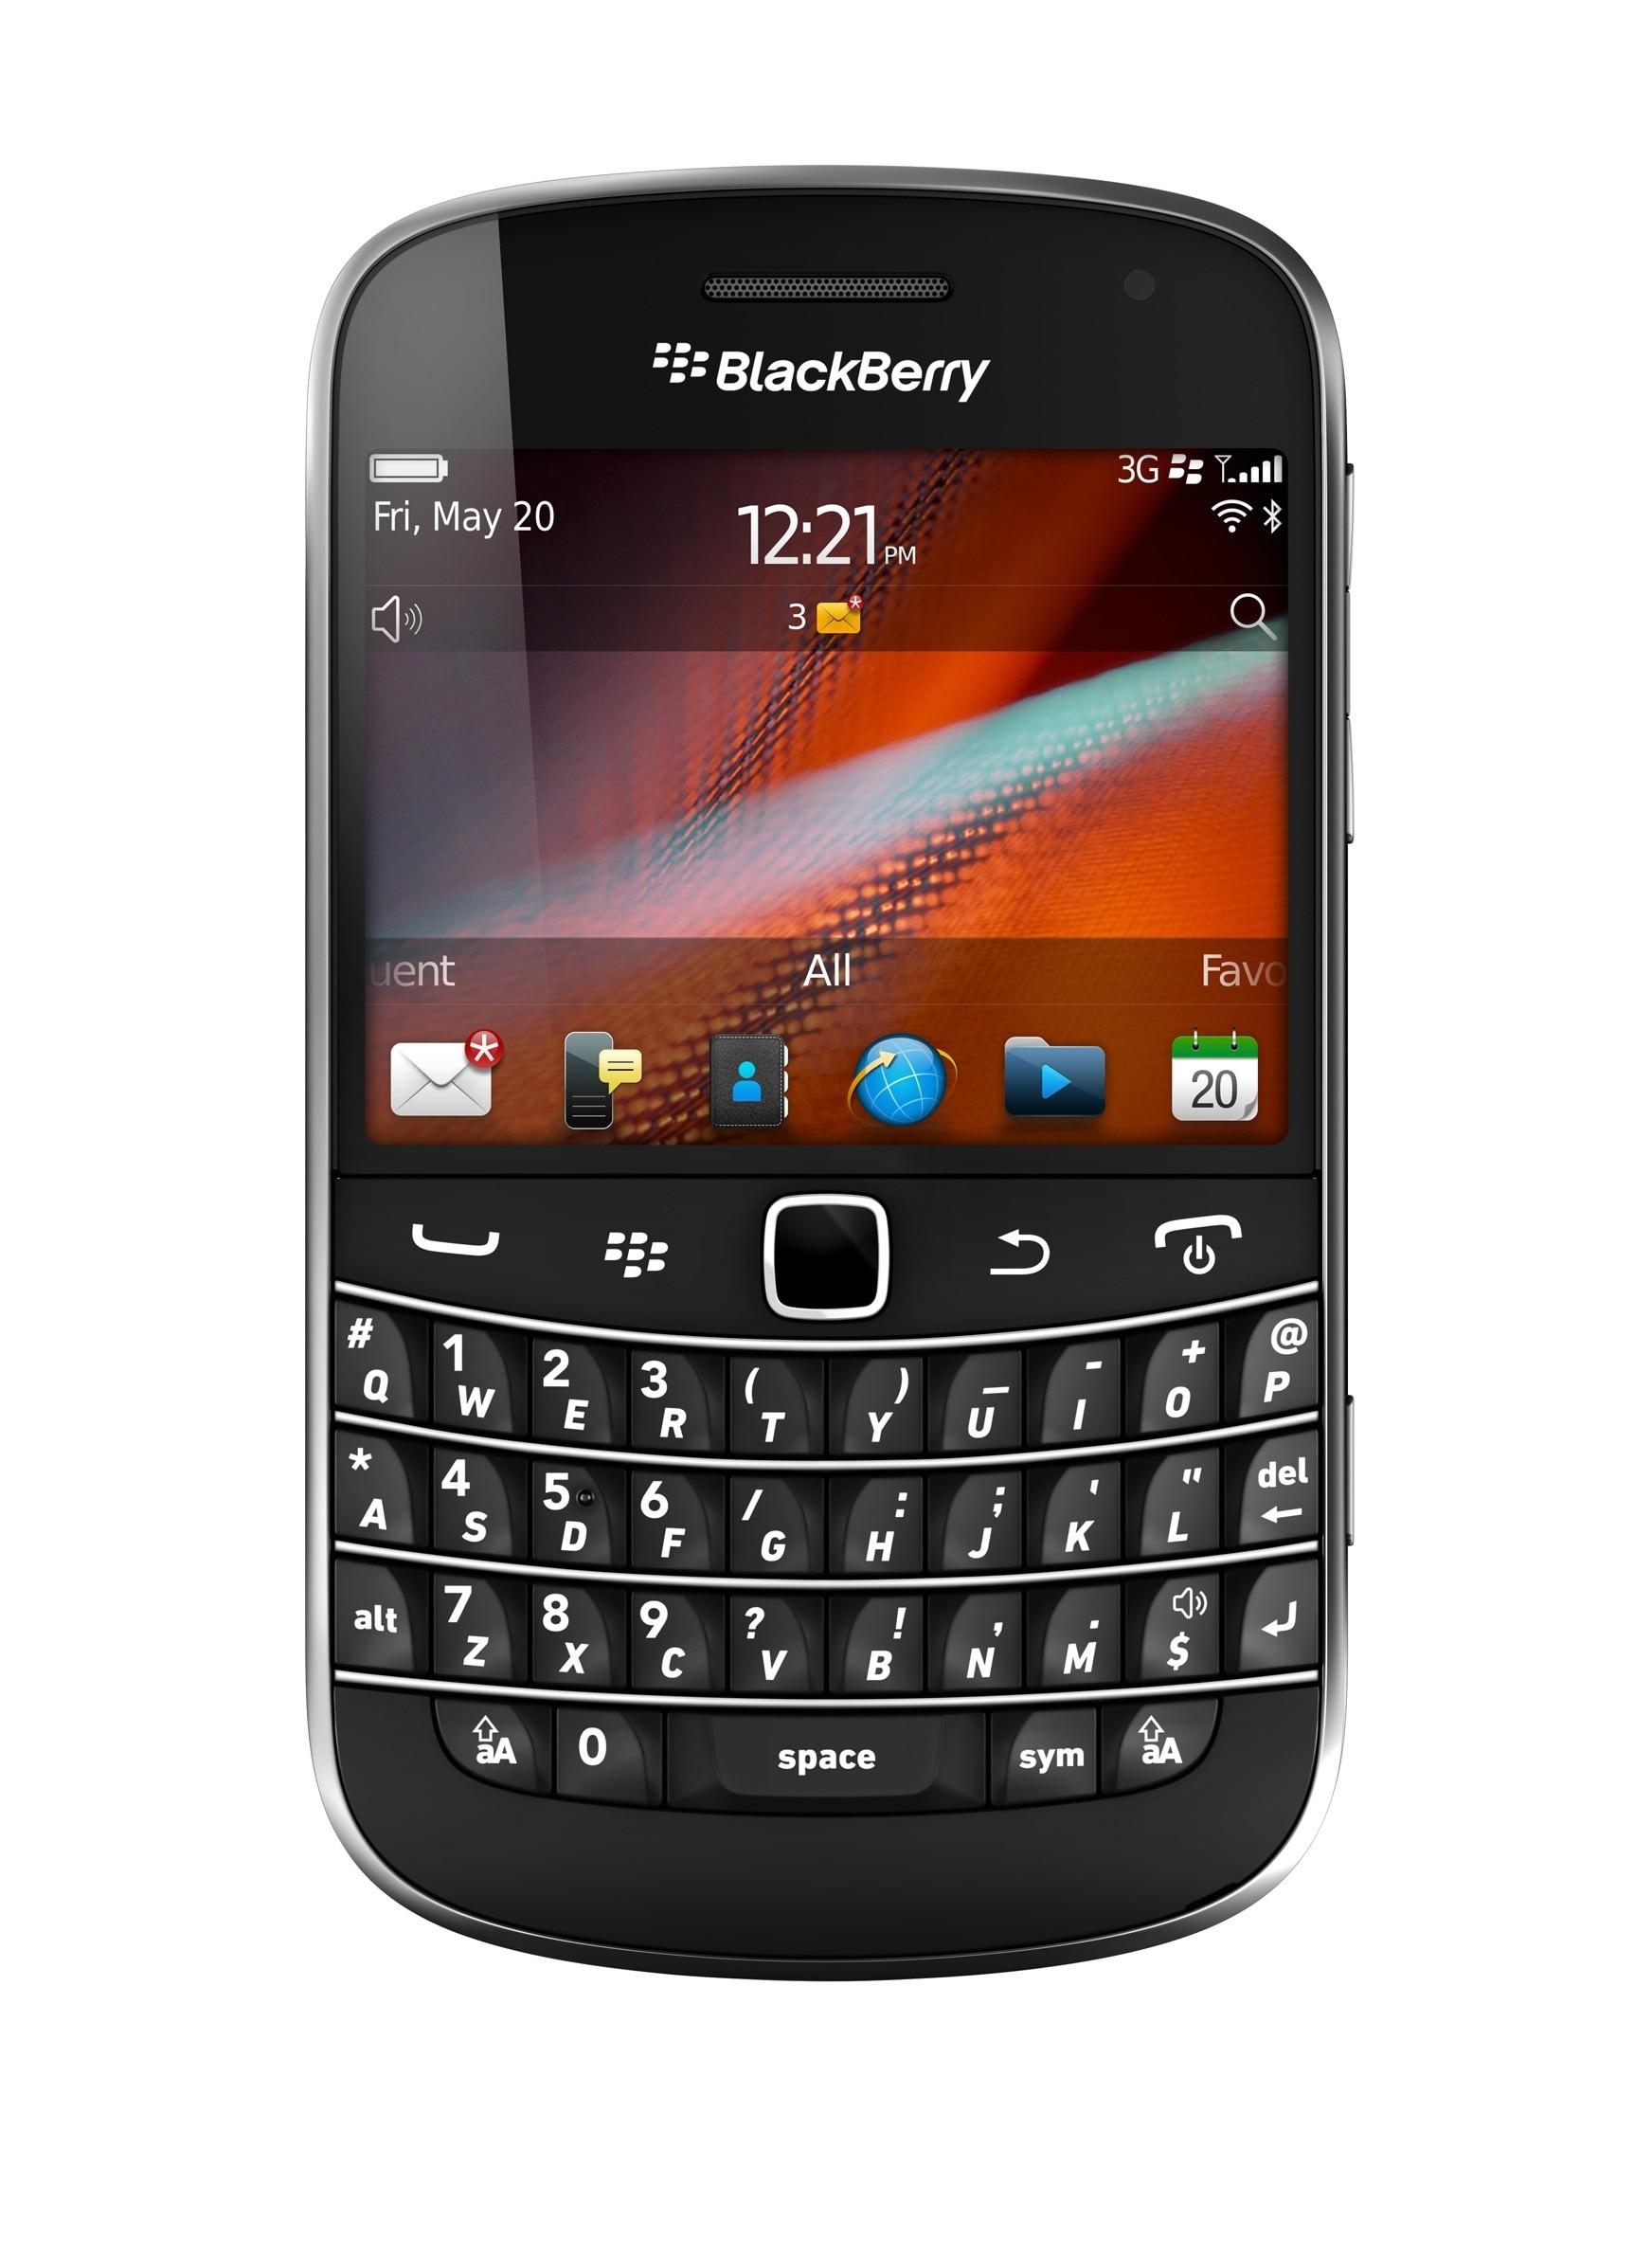 BlackBerry Bold 9900 GSM Unlocked Cell Phone